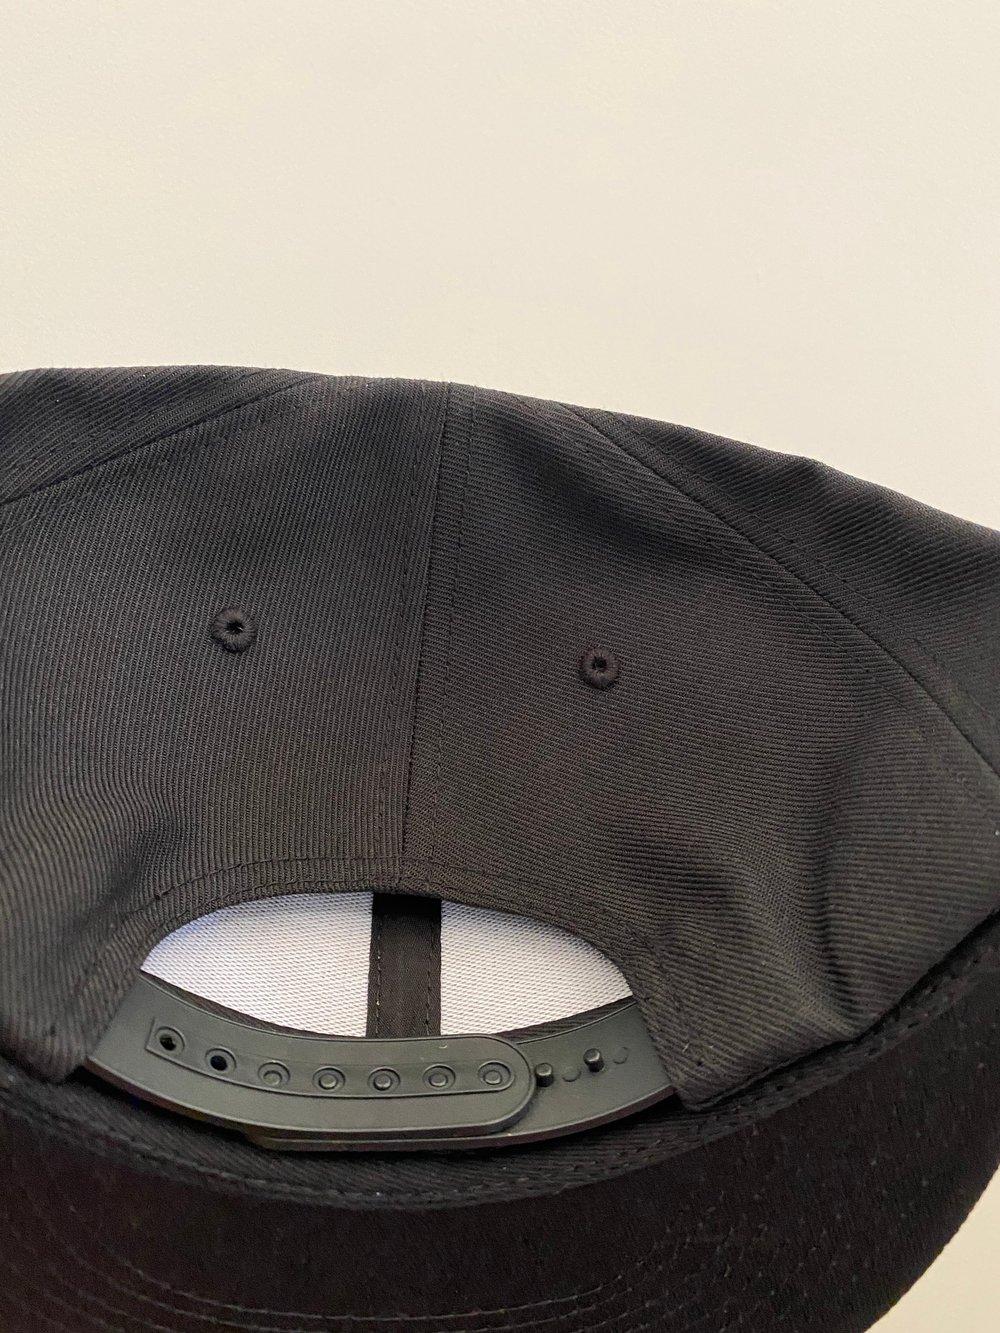 Sam PeekaBOO Snapback Hat!